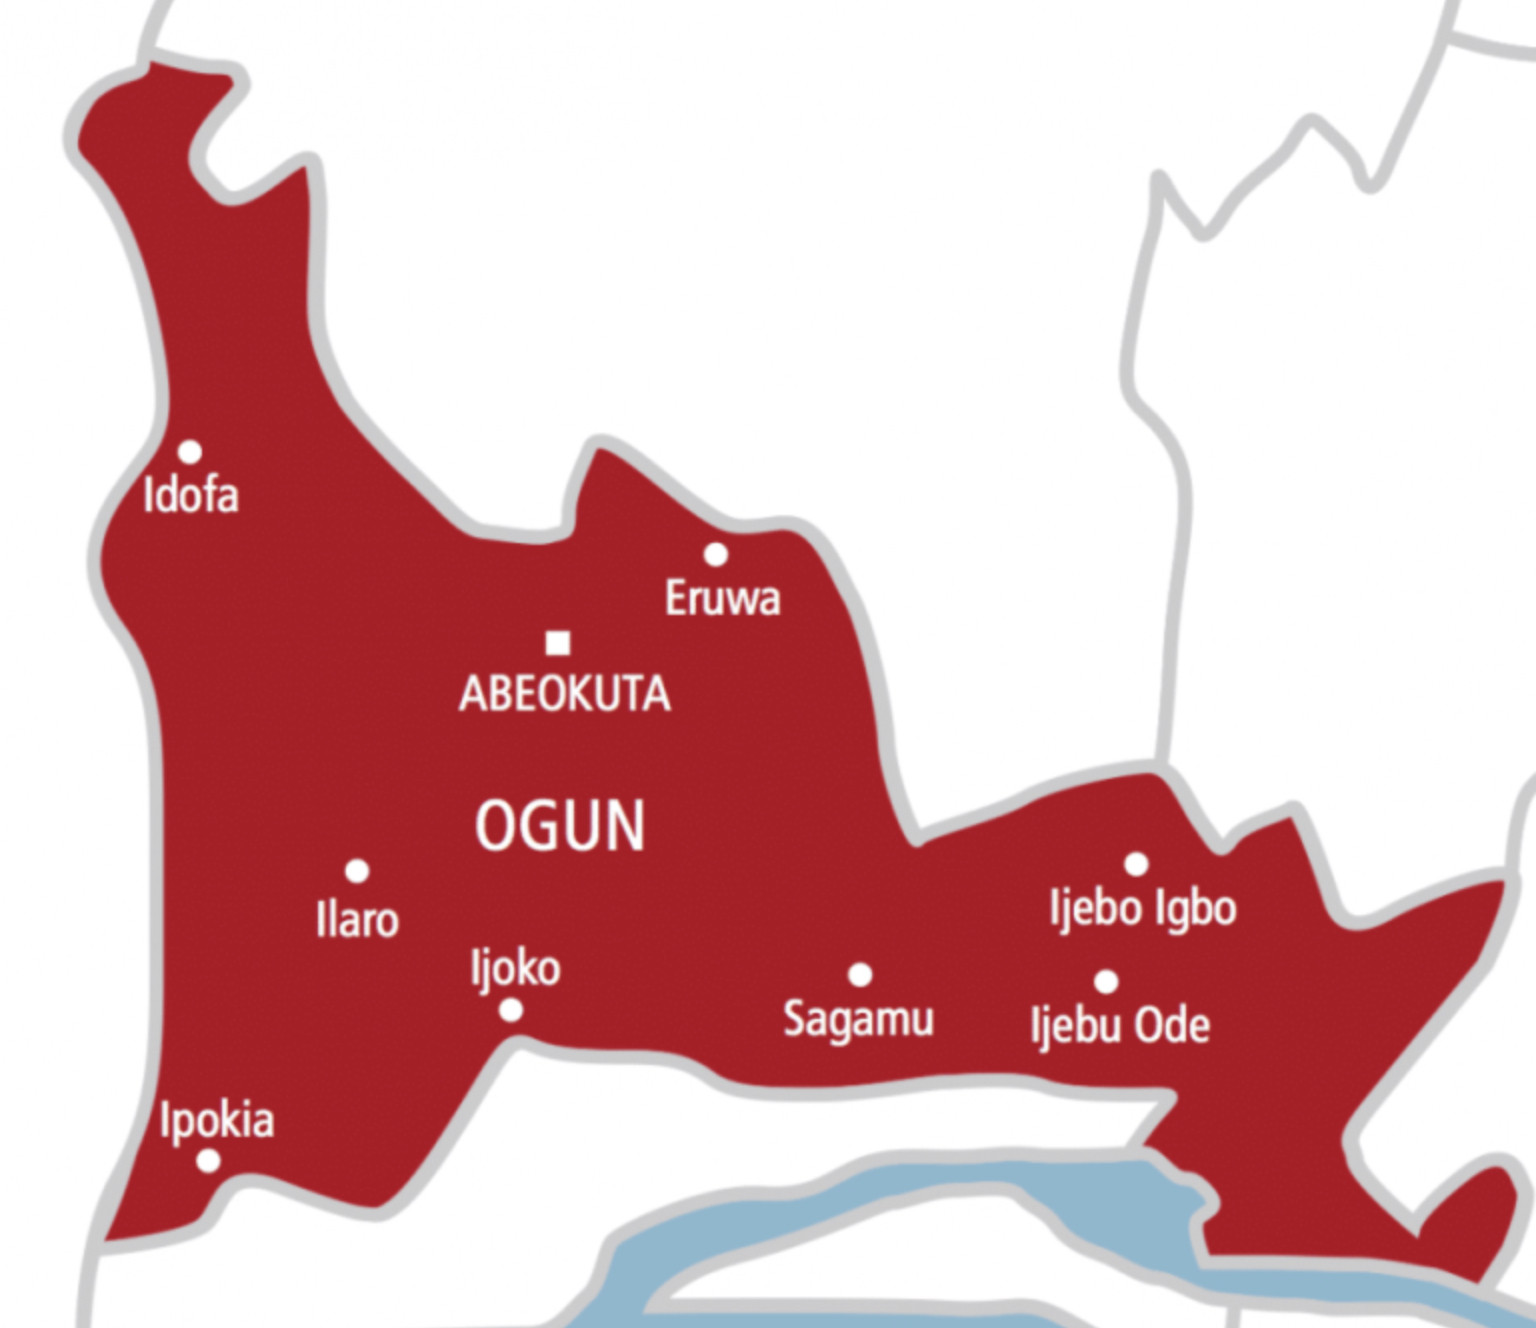 Abducted Ogun Doctor, Nurse & 13-Year-Old Boy Freed